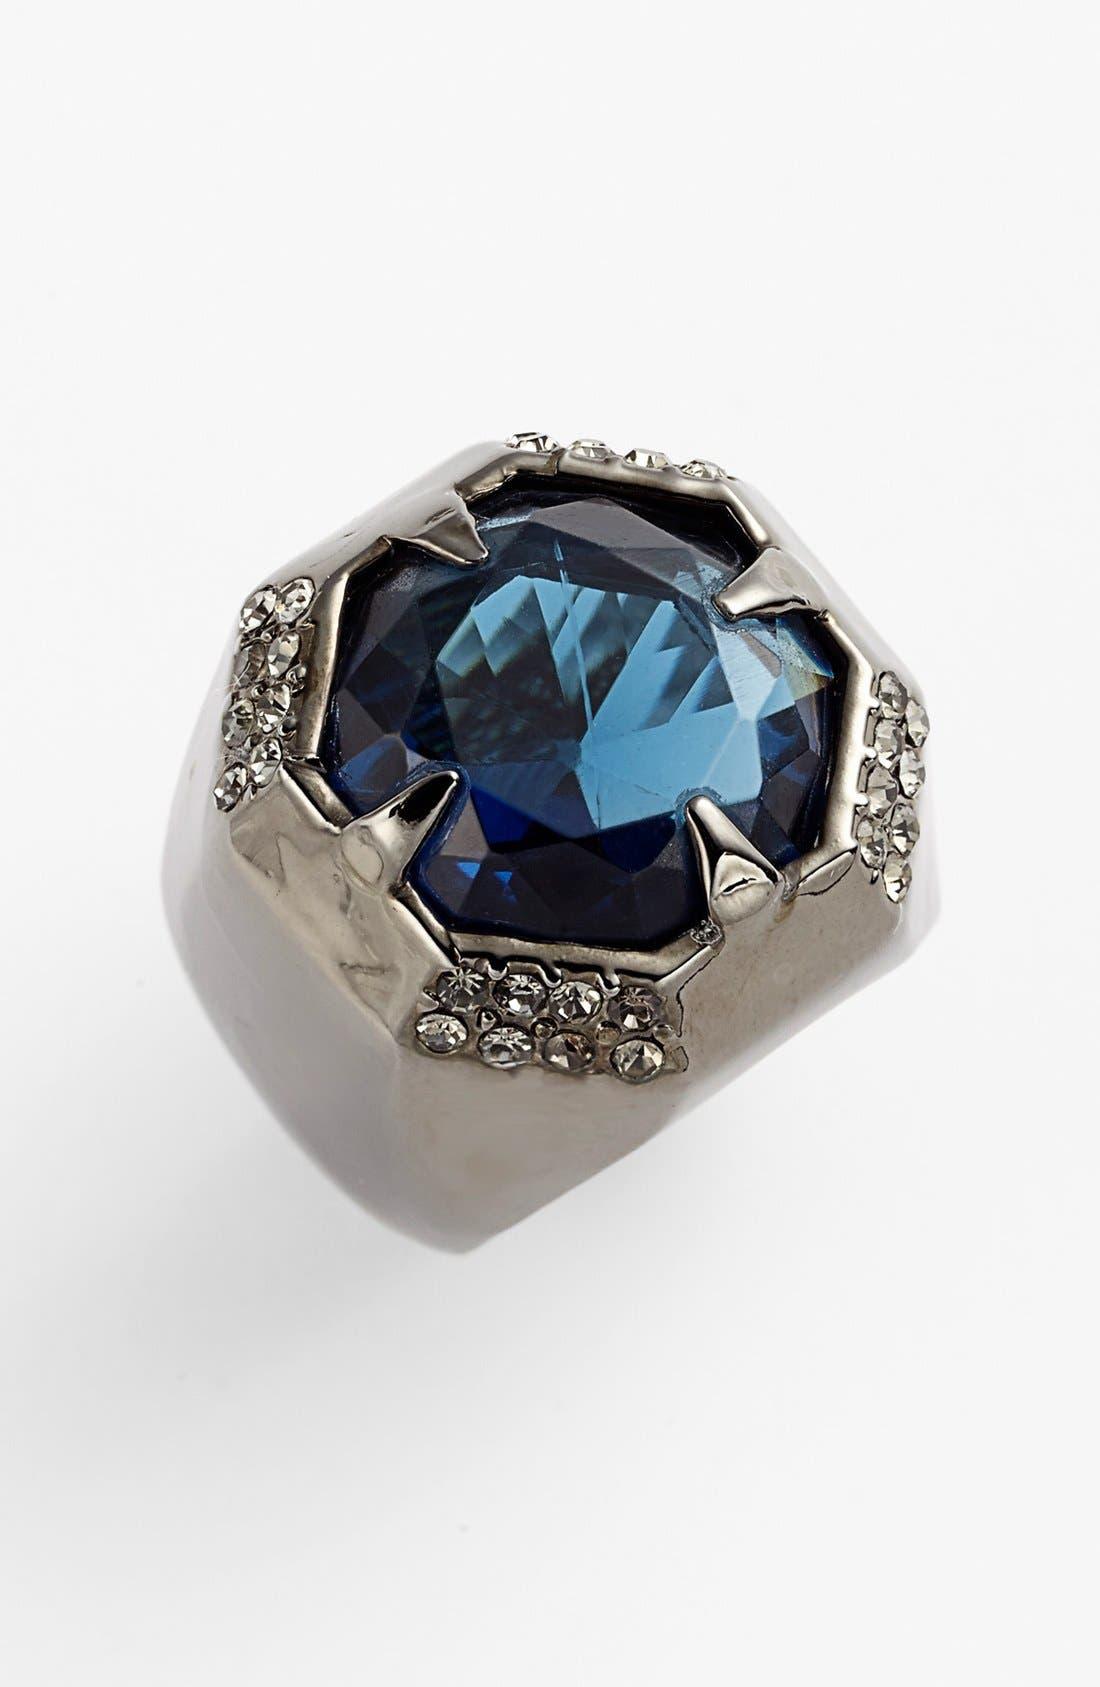 Main Image - Vince Camuto 'Jewel Purpose' Stone Cocktail Ring